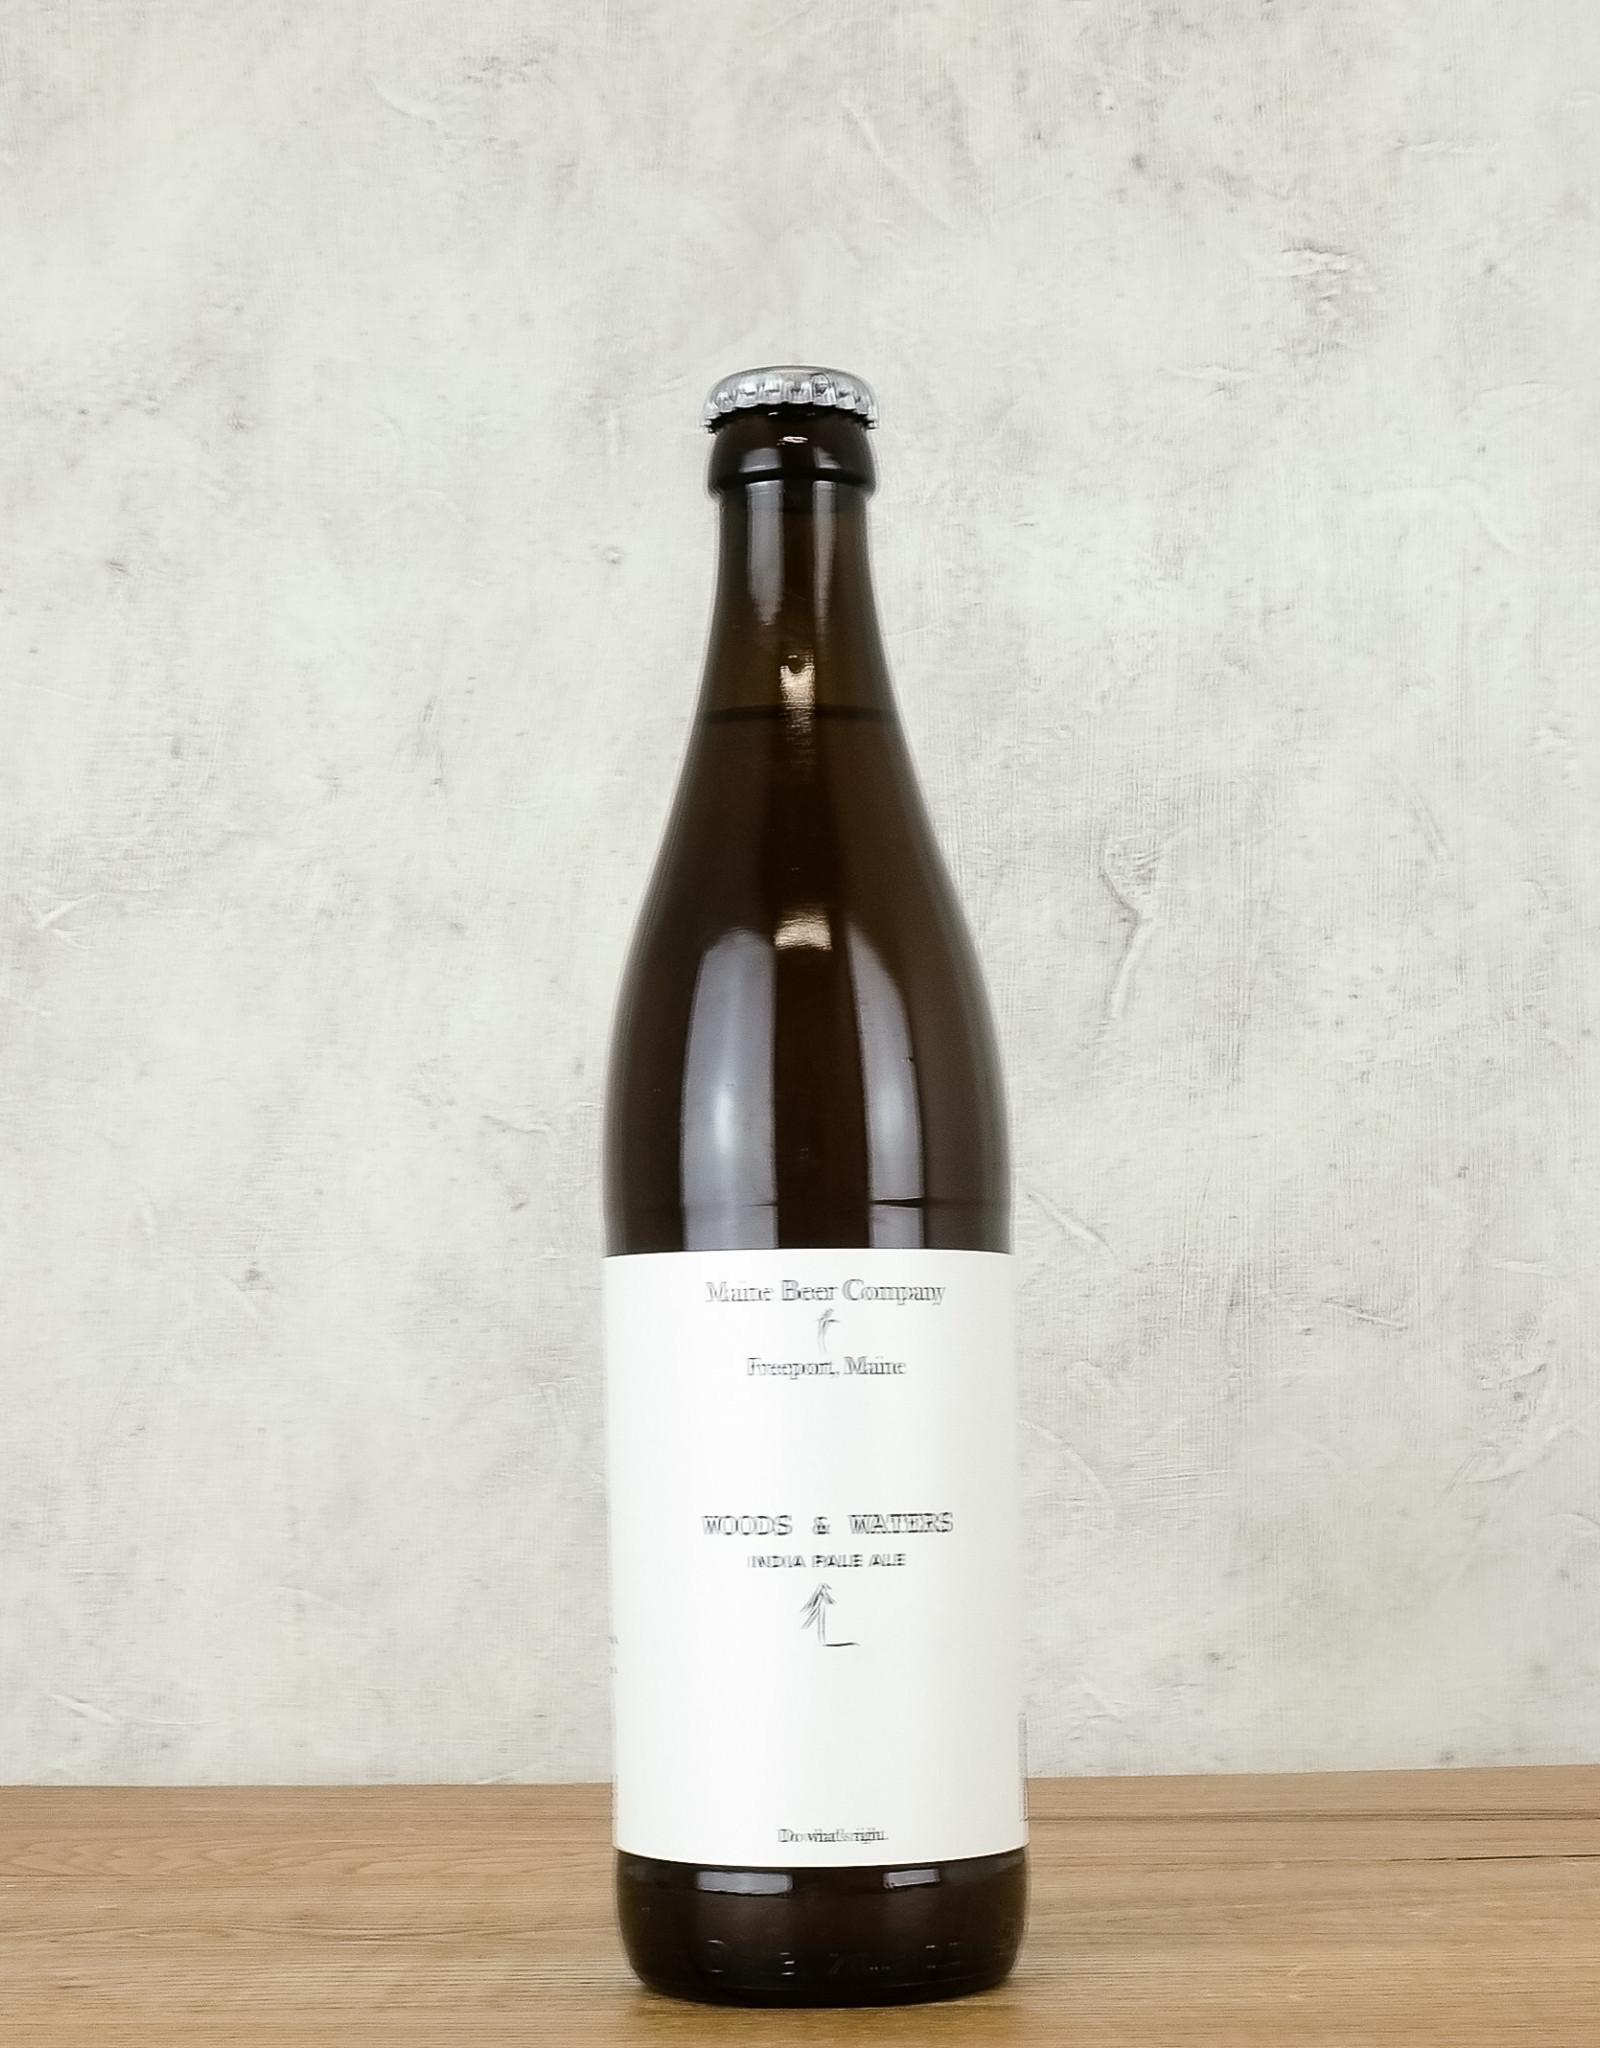 Maine Beer Company Woods & Waters IPA